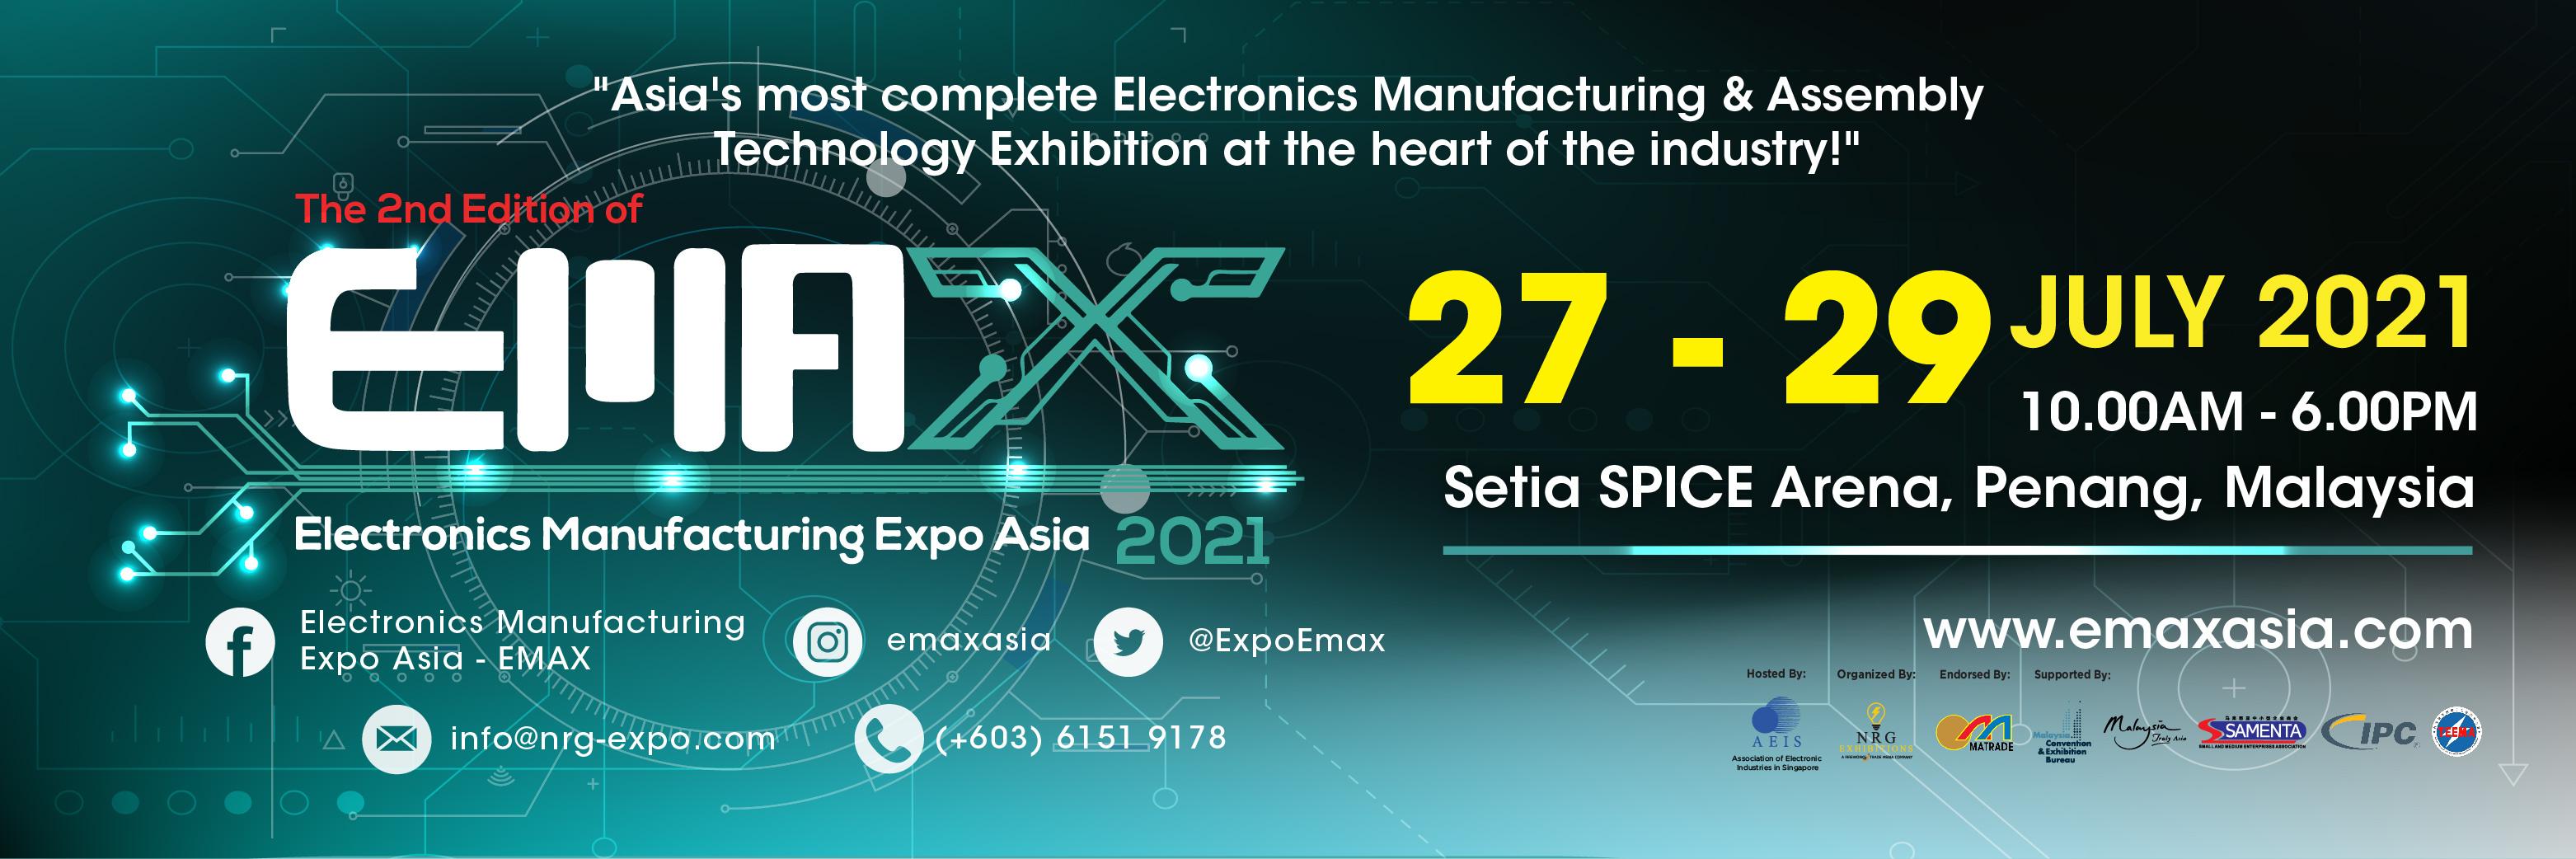 Electronics Manufacturing Expo Asia (EMAX) 2021, Setia SPICE Arena, Pulau Pinang, Malaysia